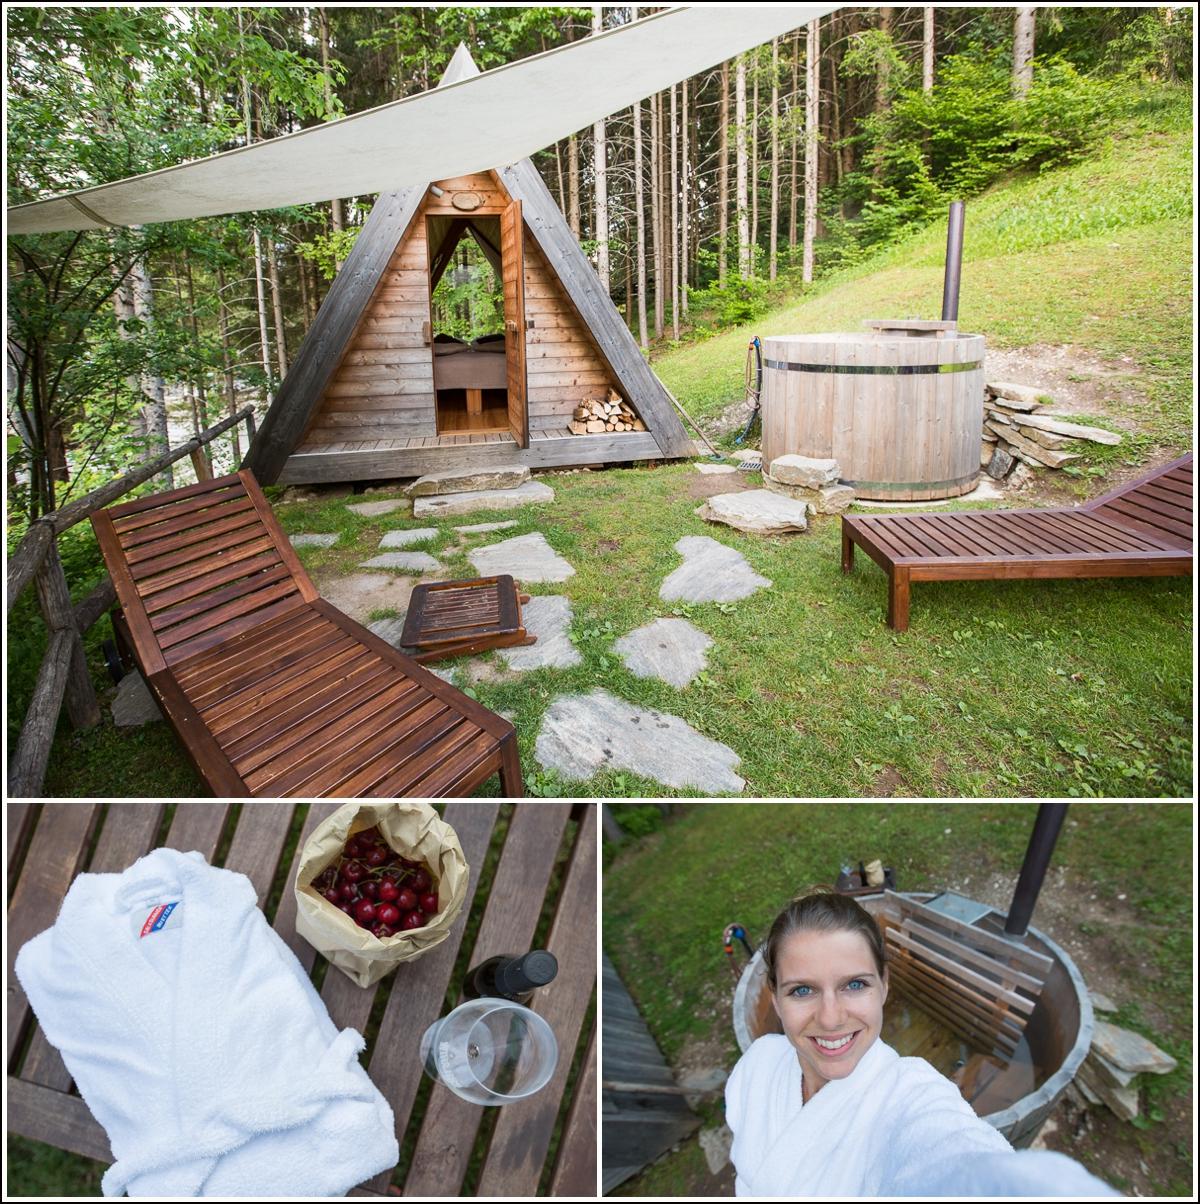 bled-camping-glamping-hut